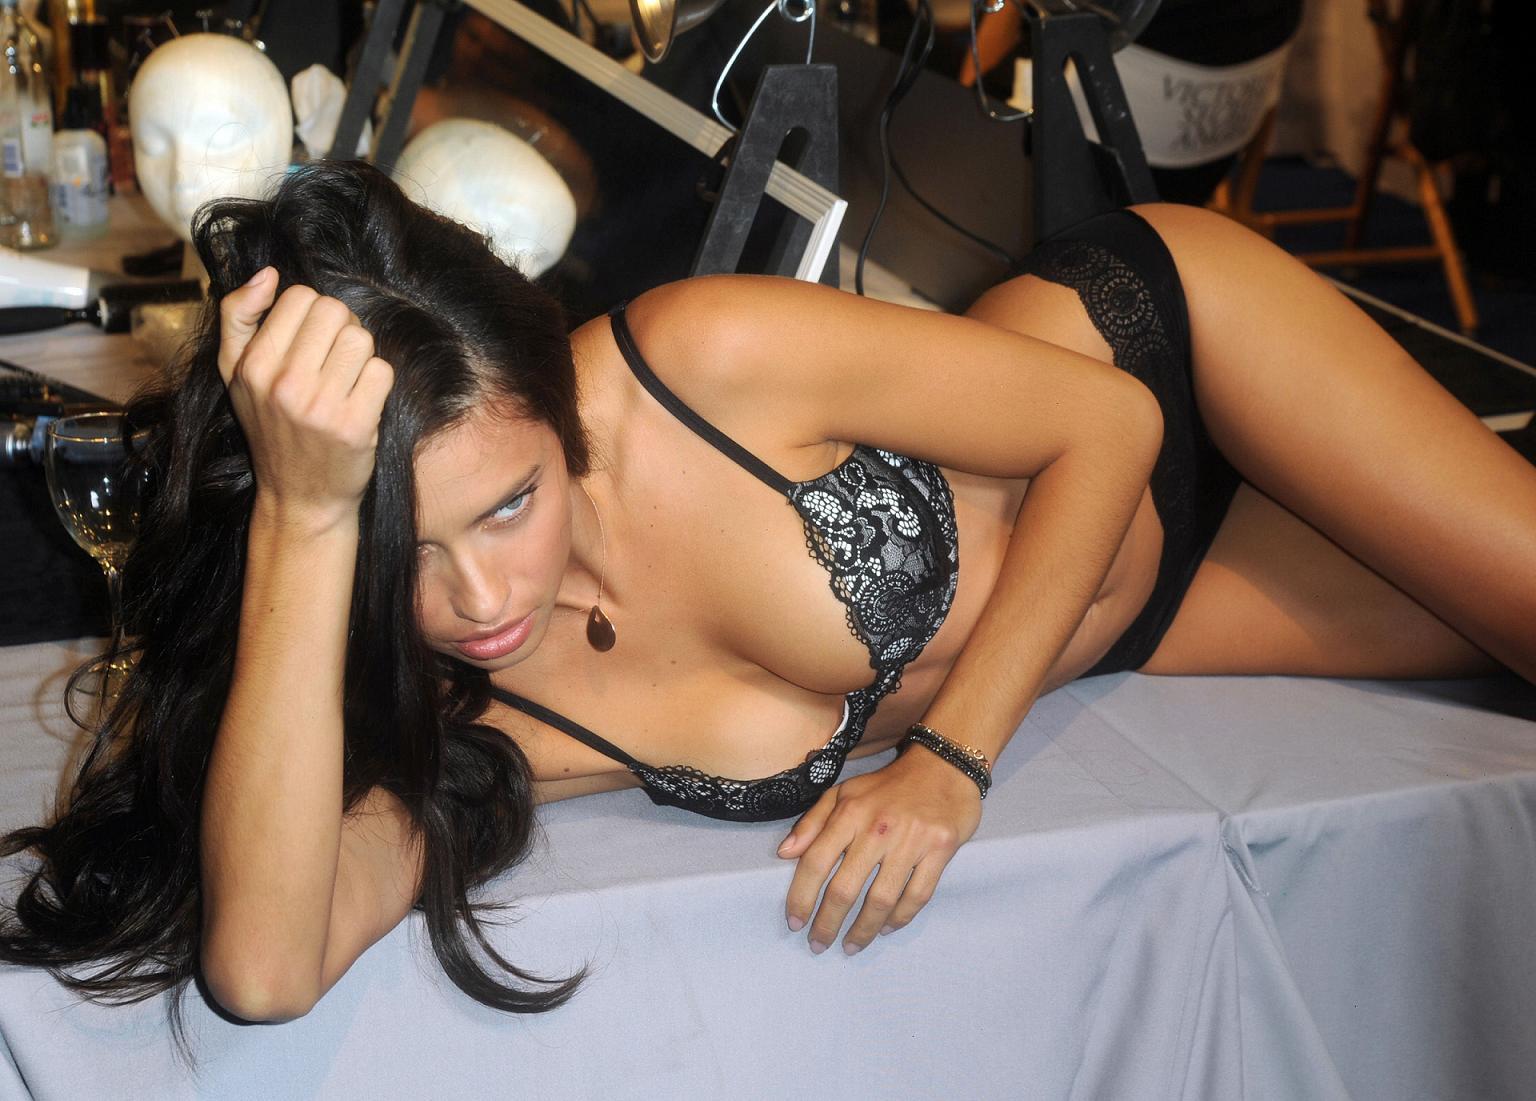 http://4.bp.blogspot.com/-owcvLhm7o1g/T1T53REcPgI/AAAAAAAAMc0/VWO5sW0zLCU/s1600/Adriana-Lima-Black-Lingerie-2012.jpg